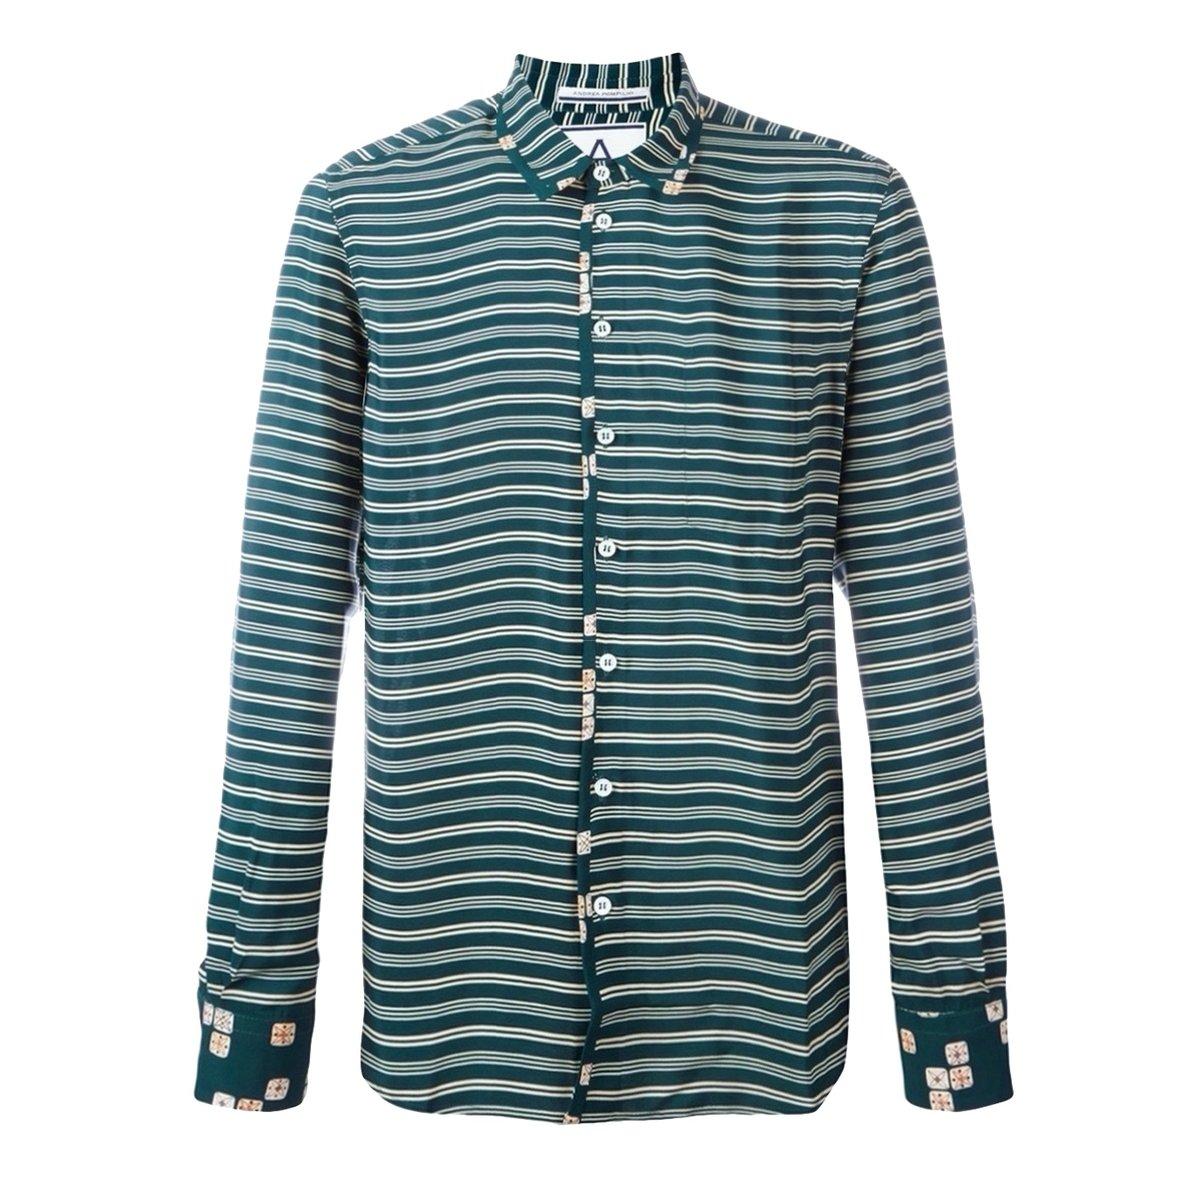 andrea pompilio striped viscose shirt green.jpg